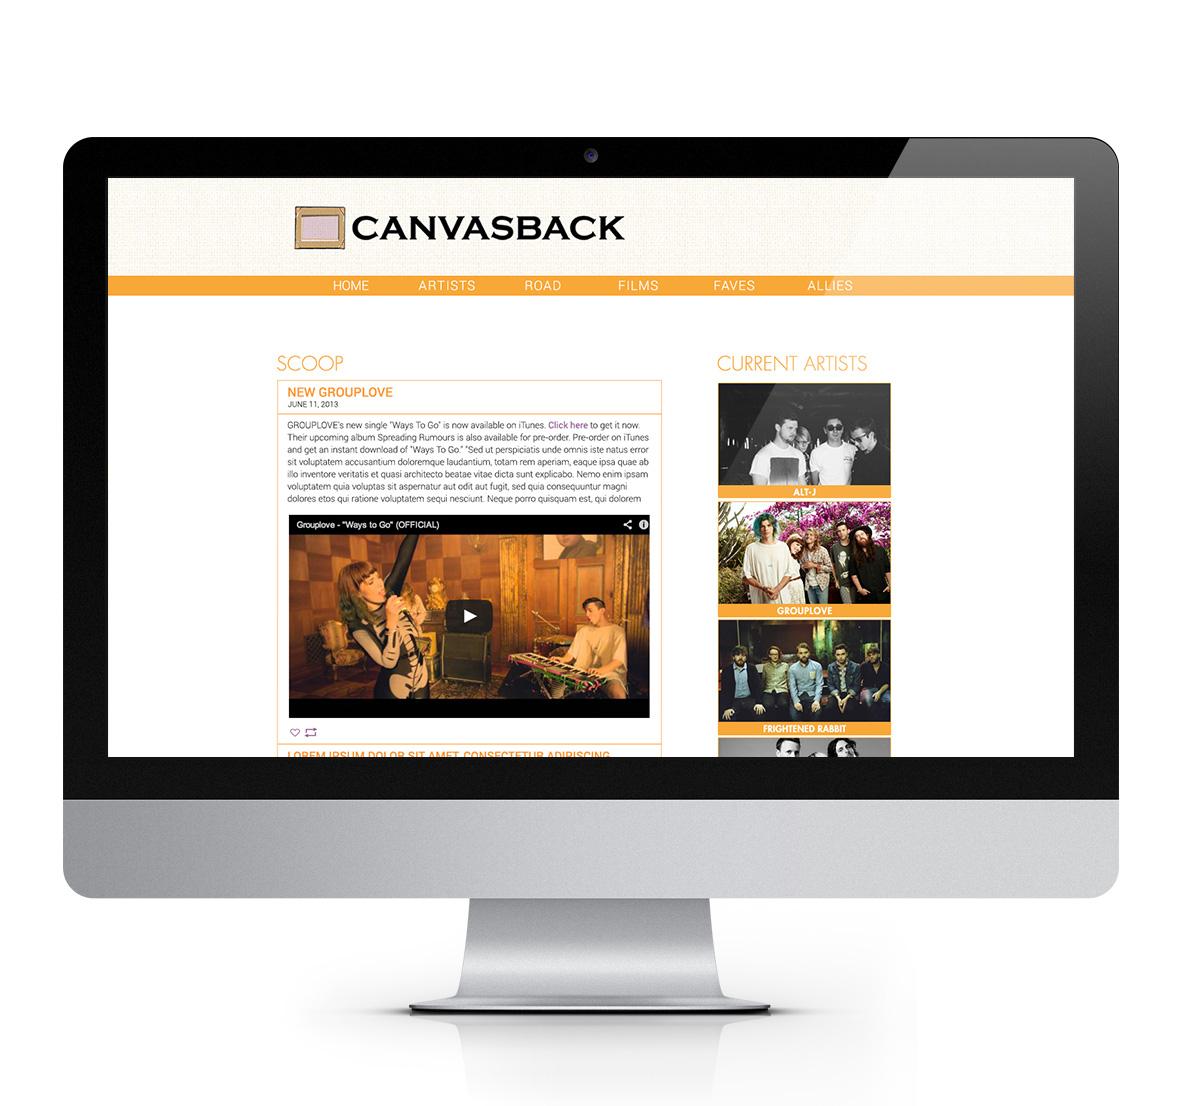 canvasback1.jpg